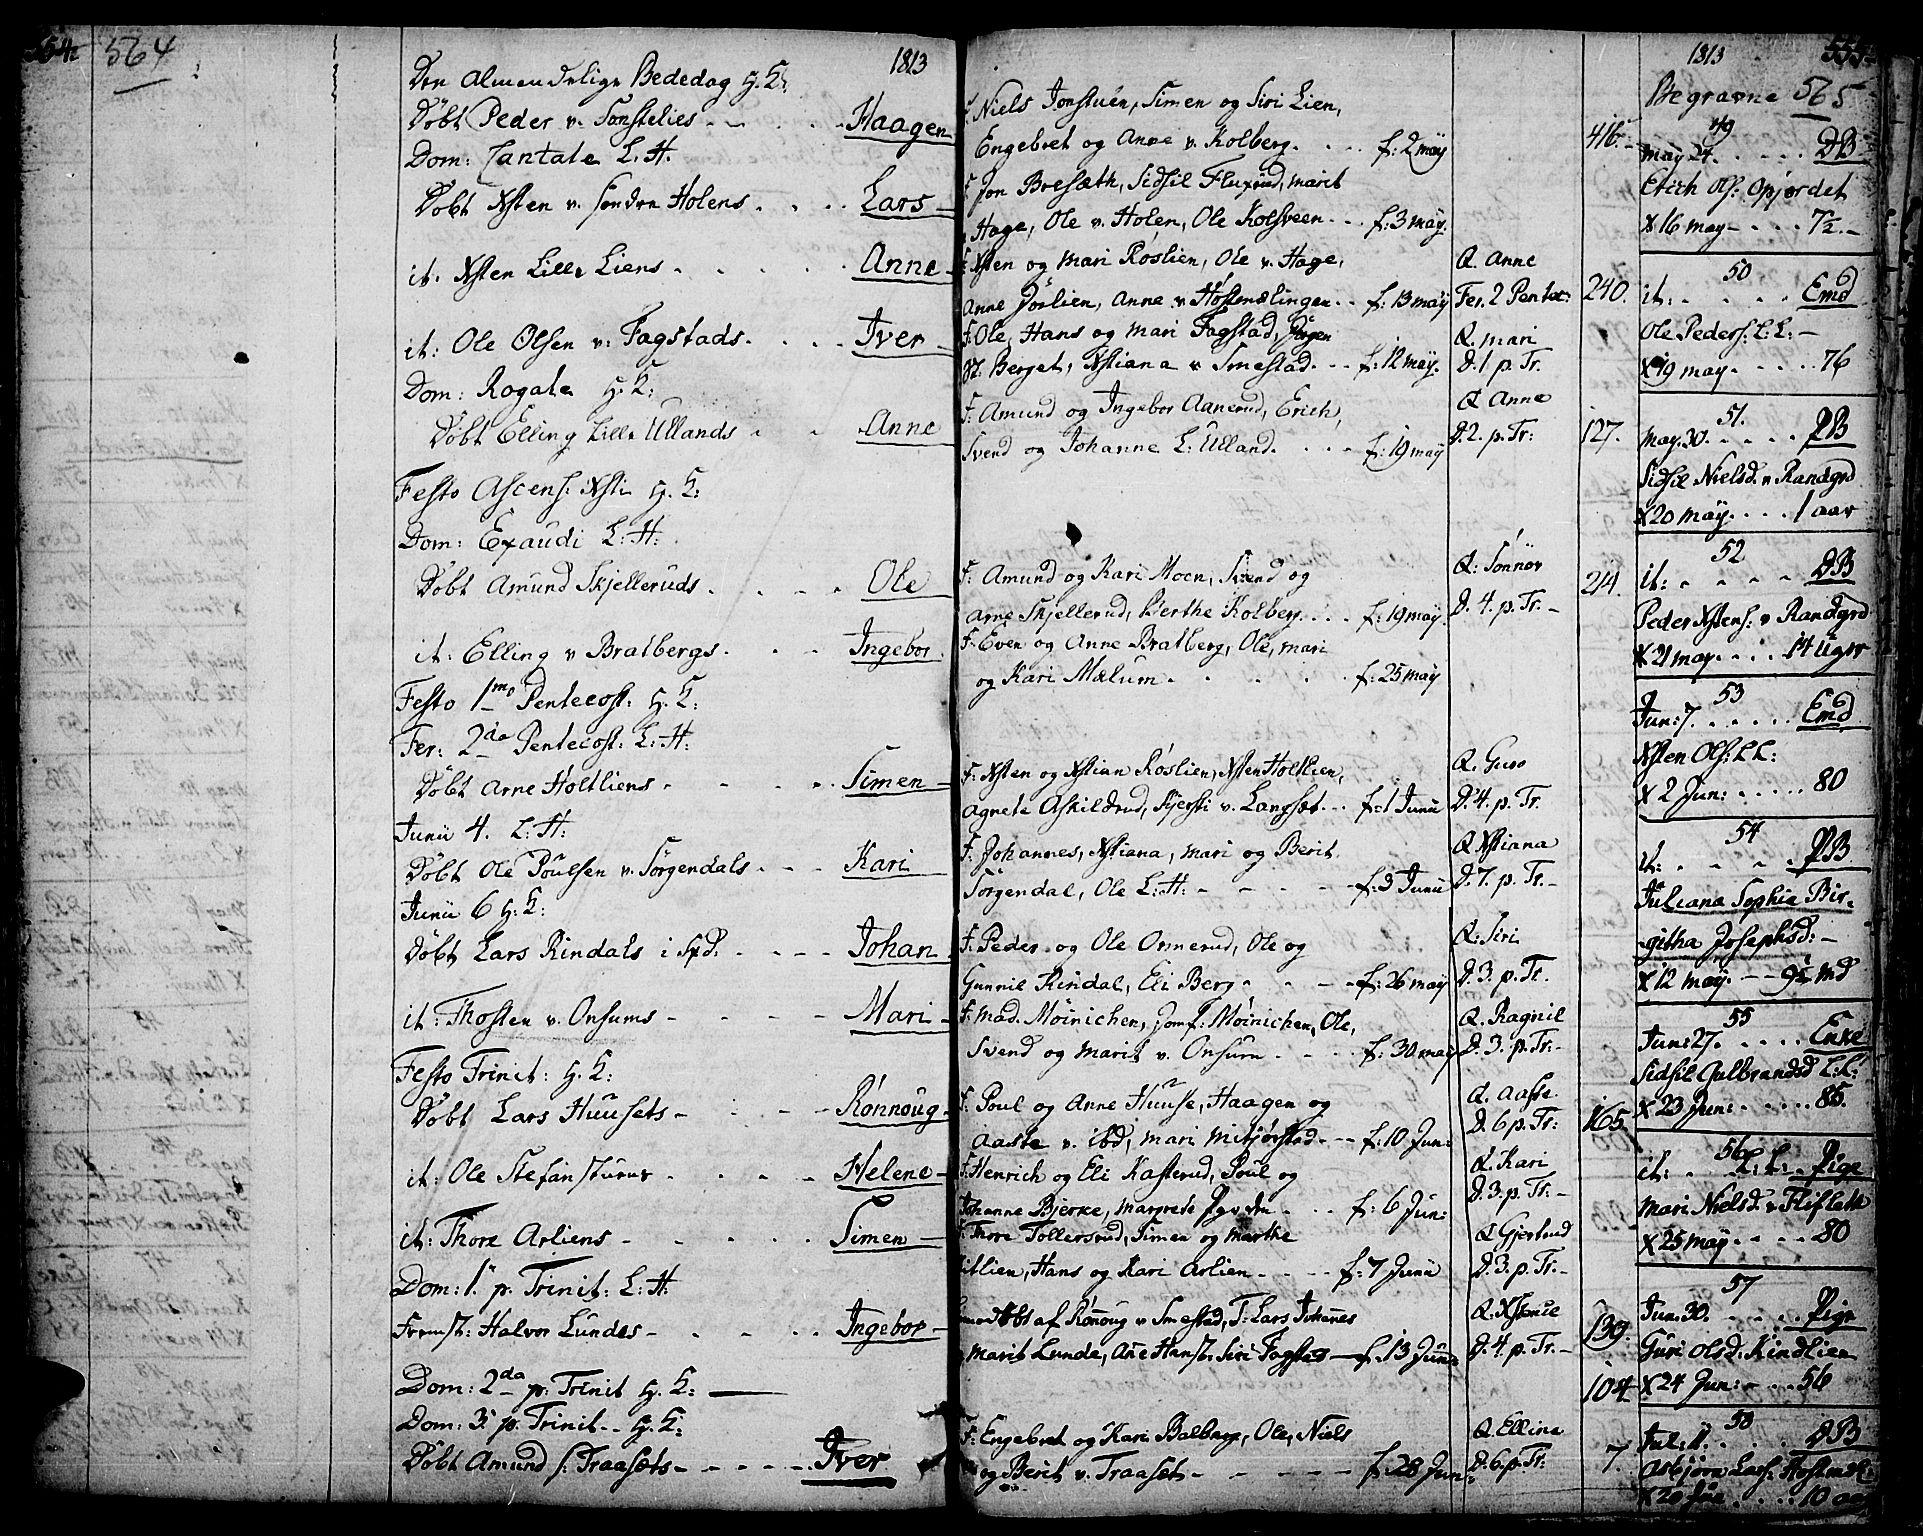 SAH, Fåberg prestekontor, Ministerialbok nr. 2, 1775-1818, s. 564-565